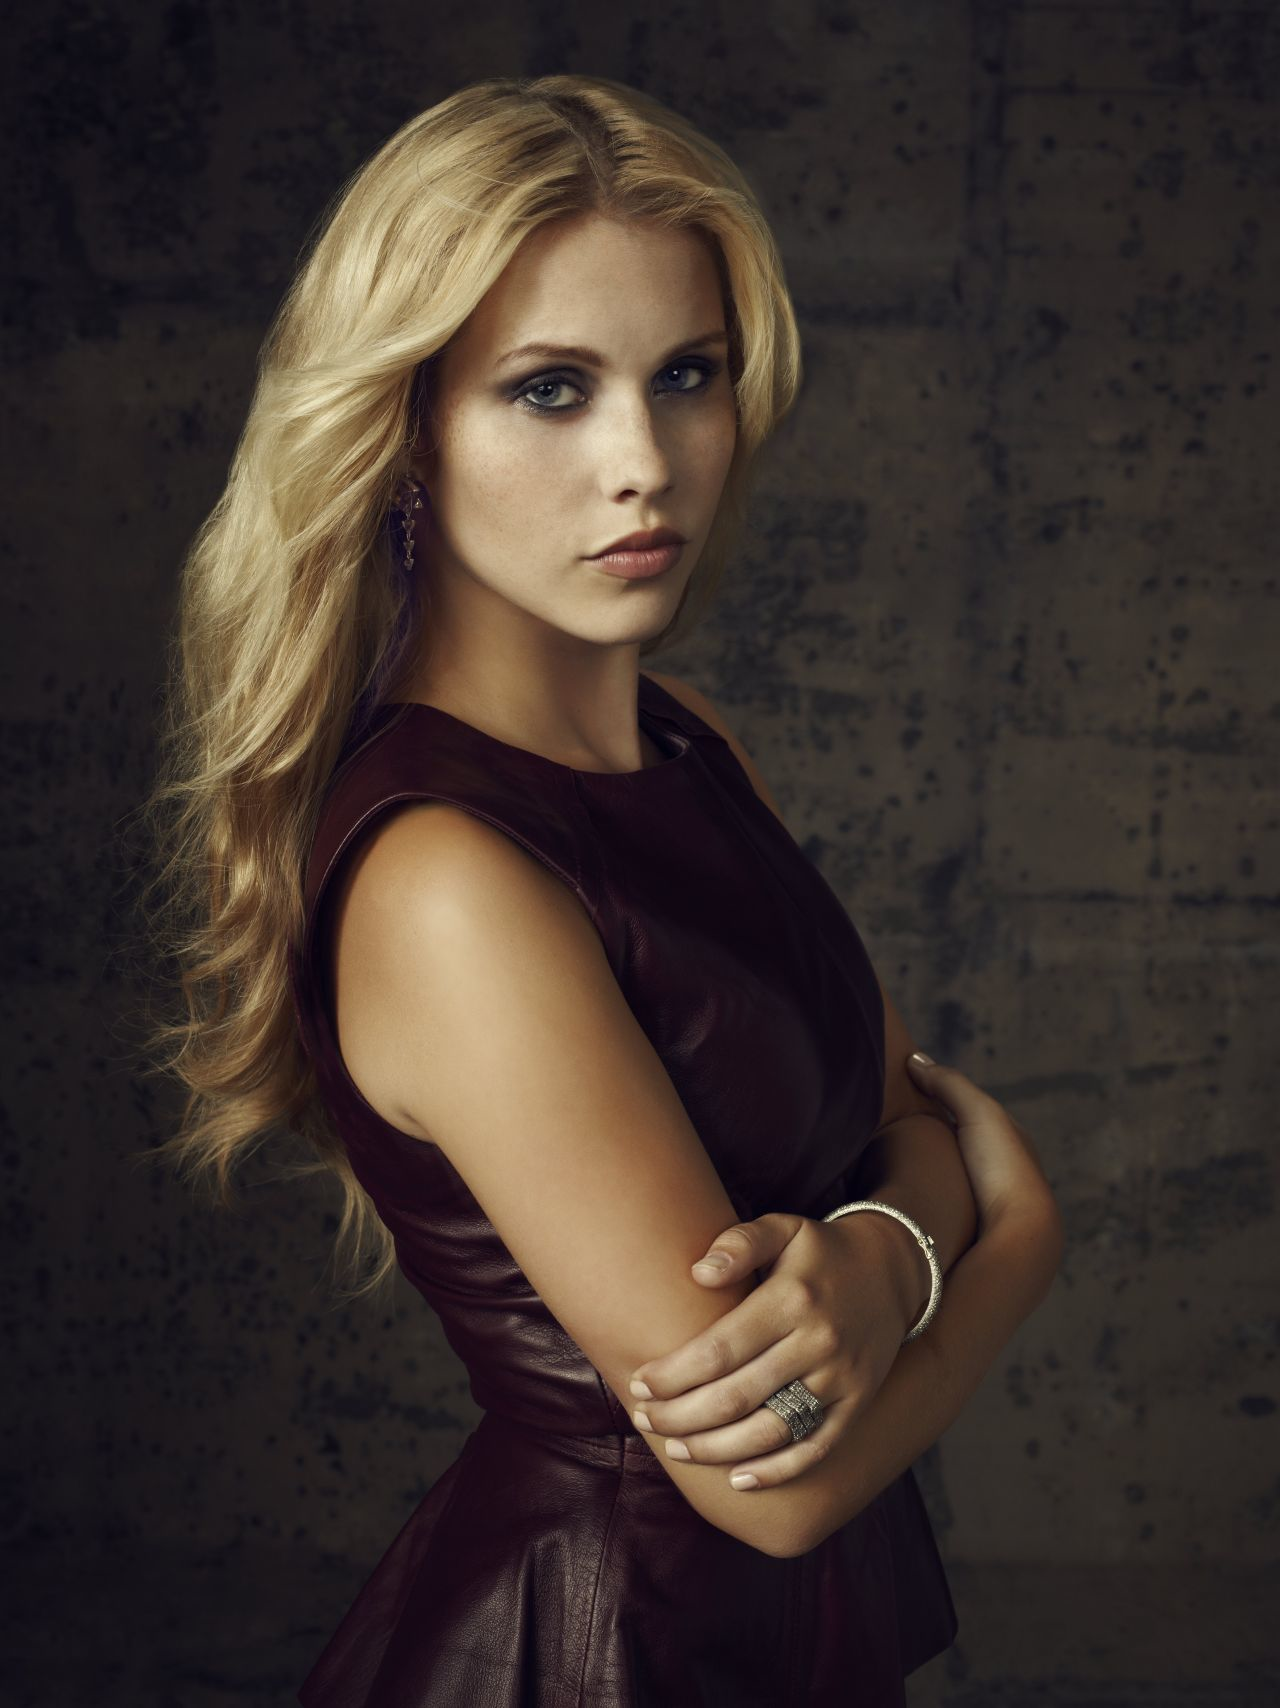 Rebekah Mikaelson | Villains Wiki | Fandom powered by Wikia  Rebekah Mikaels...